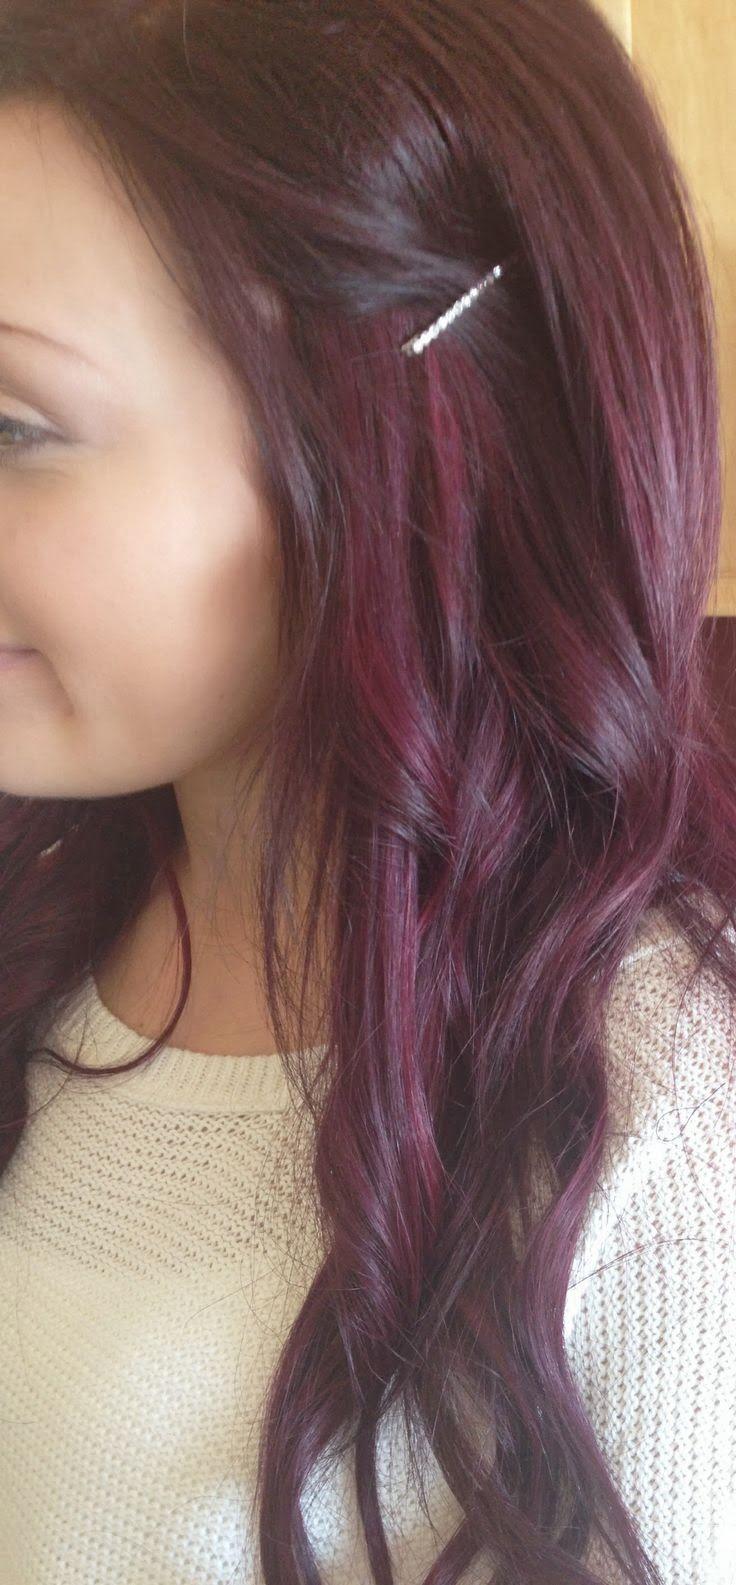 Best Hair Color Images On Pinterest - Next hair